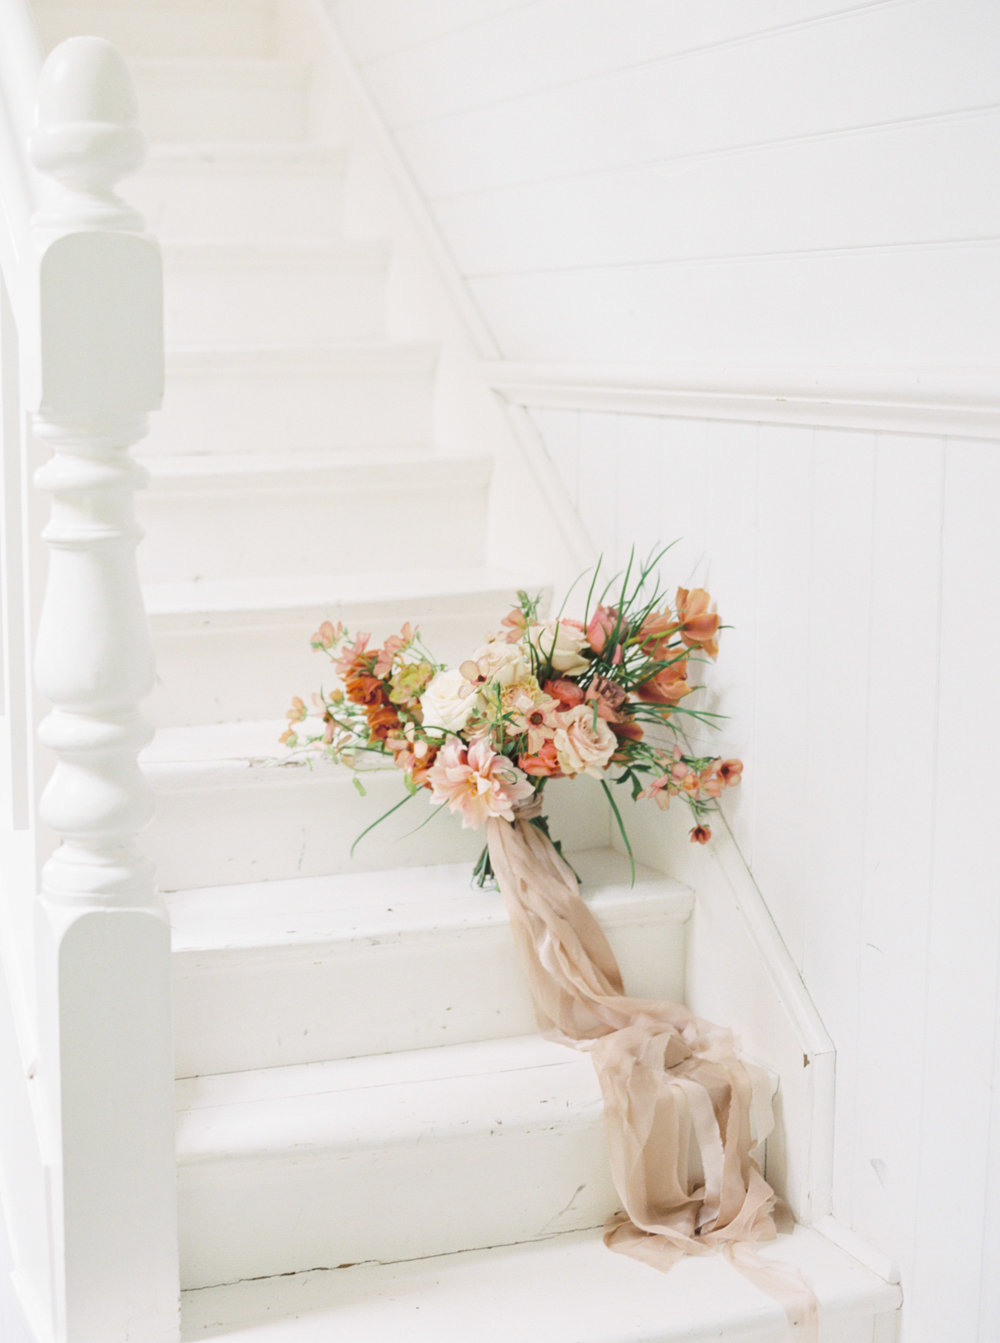 Timeless Southern Highland Wedding Elopement in Bowral NSW Fine Art Film Photographer Sheri McMahon-2.jpg